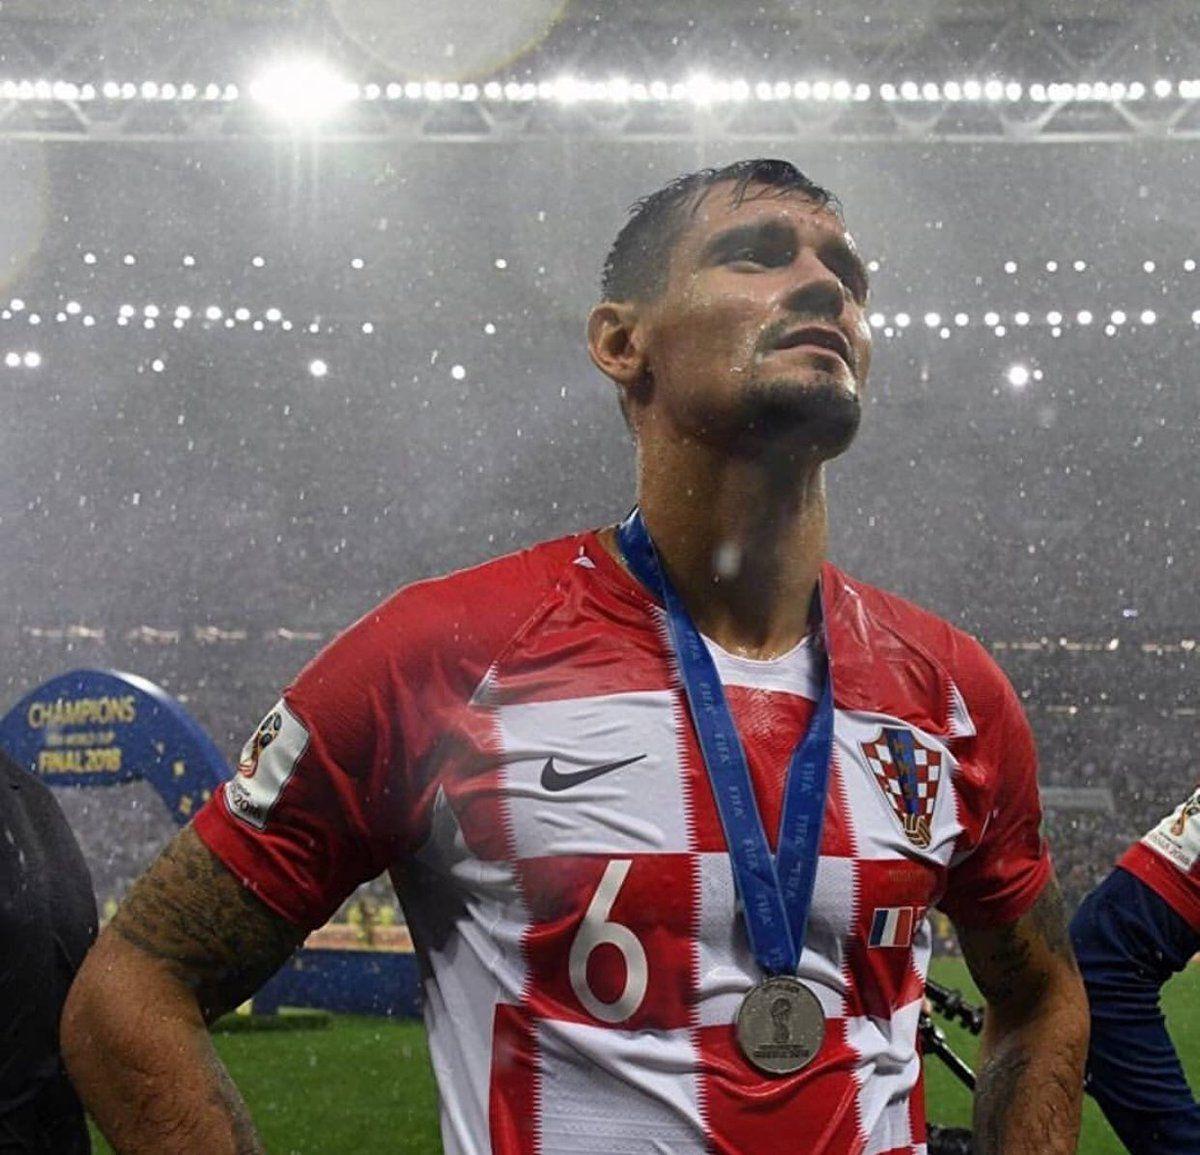 Pin By Josipa On Hns Dejan Lovren Football Soccer